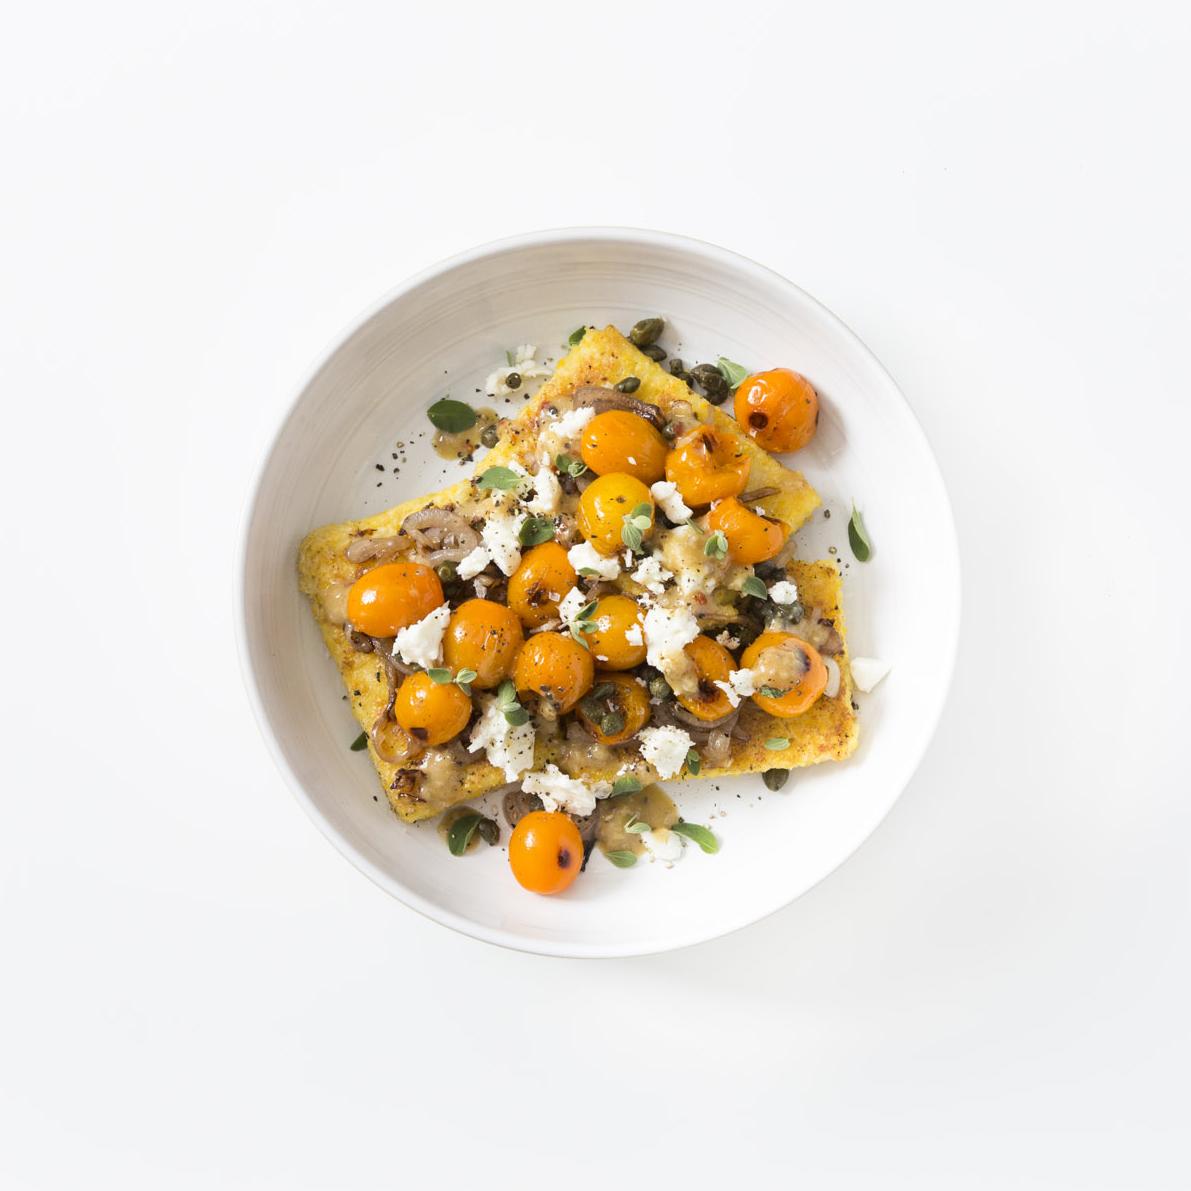 Plancha-Vegetables-TomatoesFetaPolenta_F-10.jpg